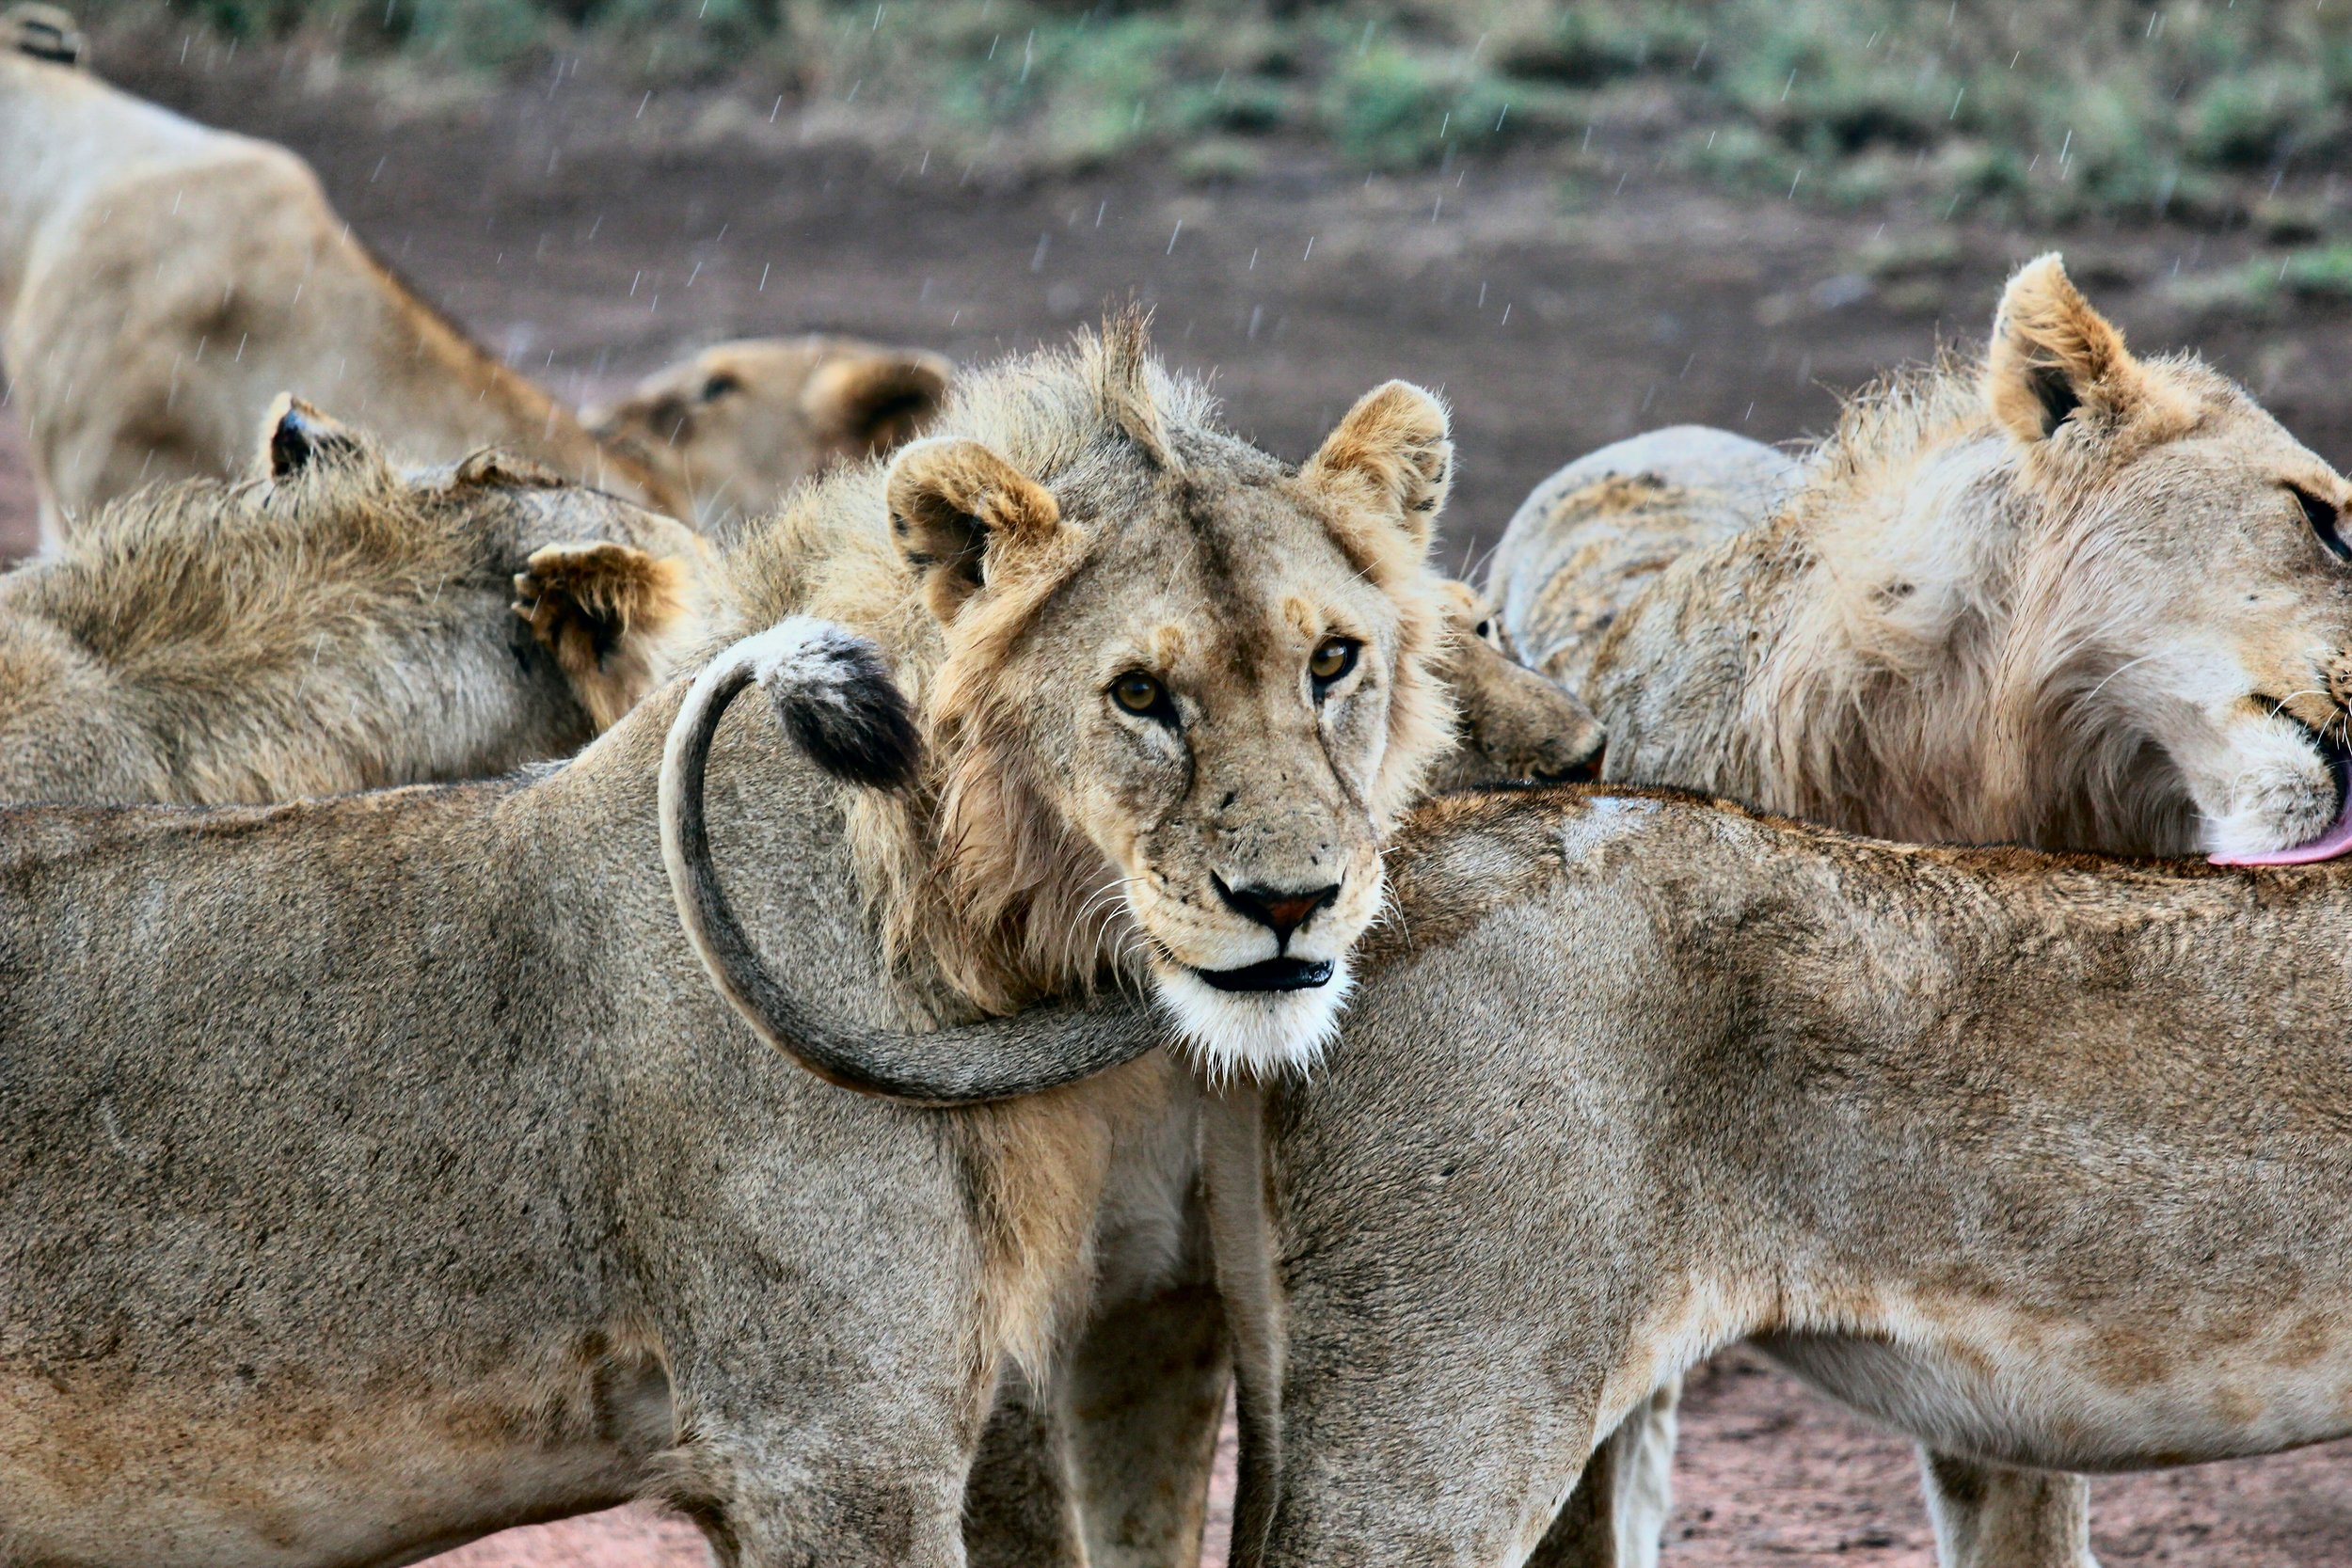 Pride of lions in Serengeti National Park, Tanzania. Photo by  joel herzog  on  Unsplash